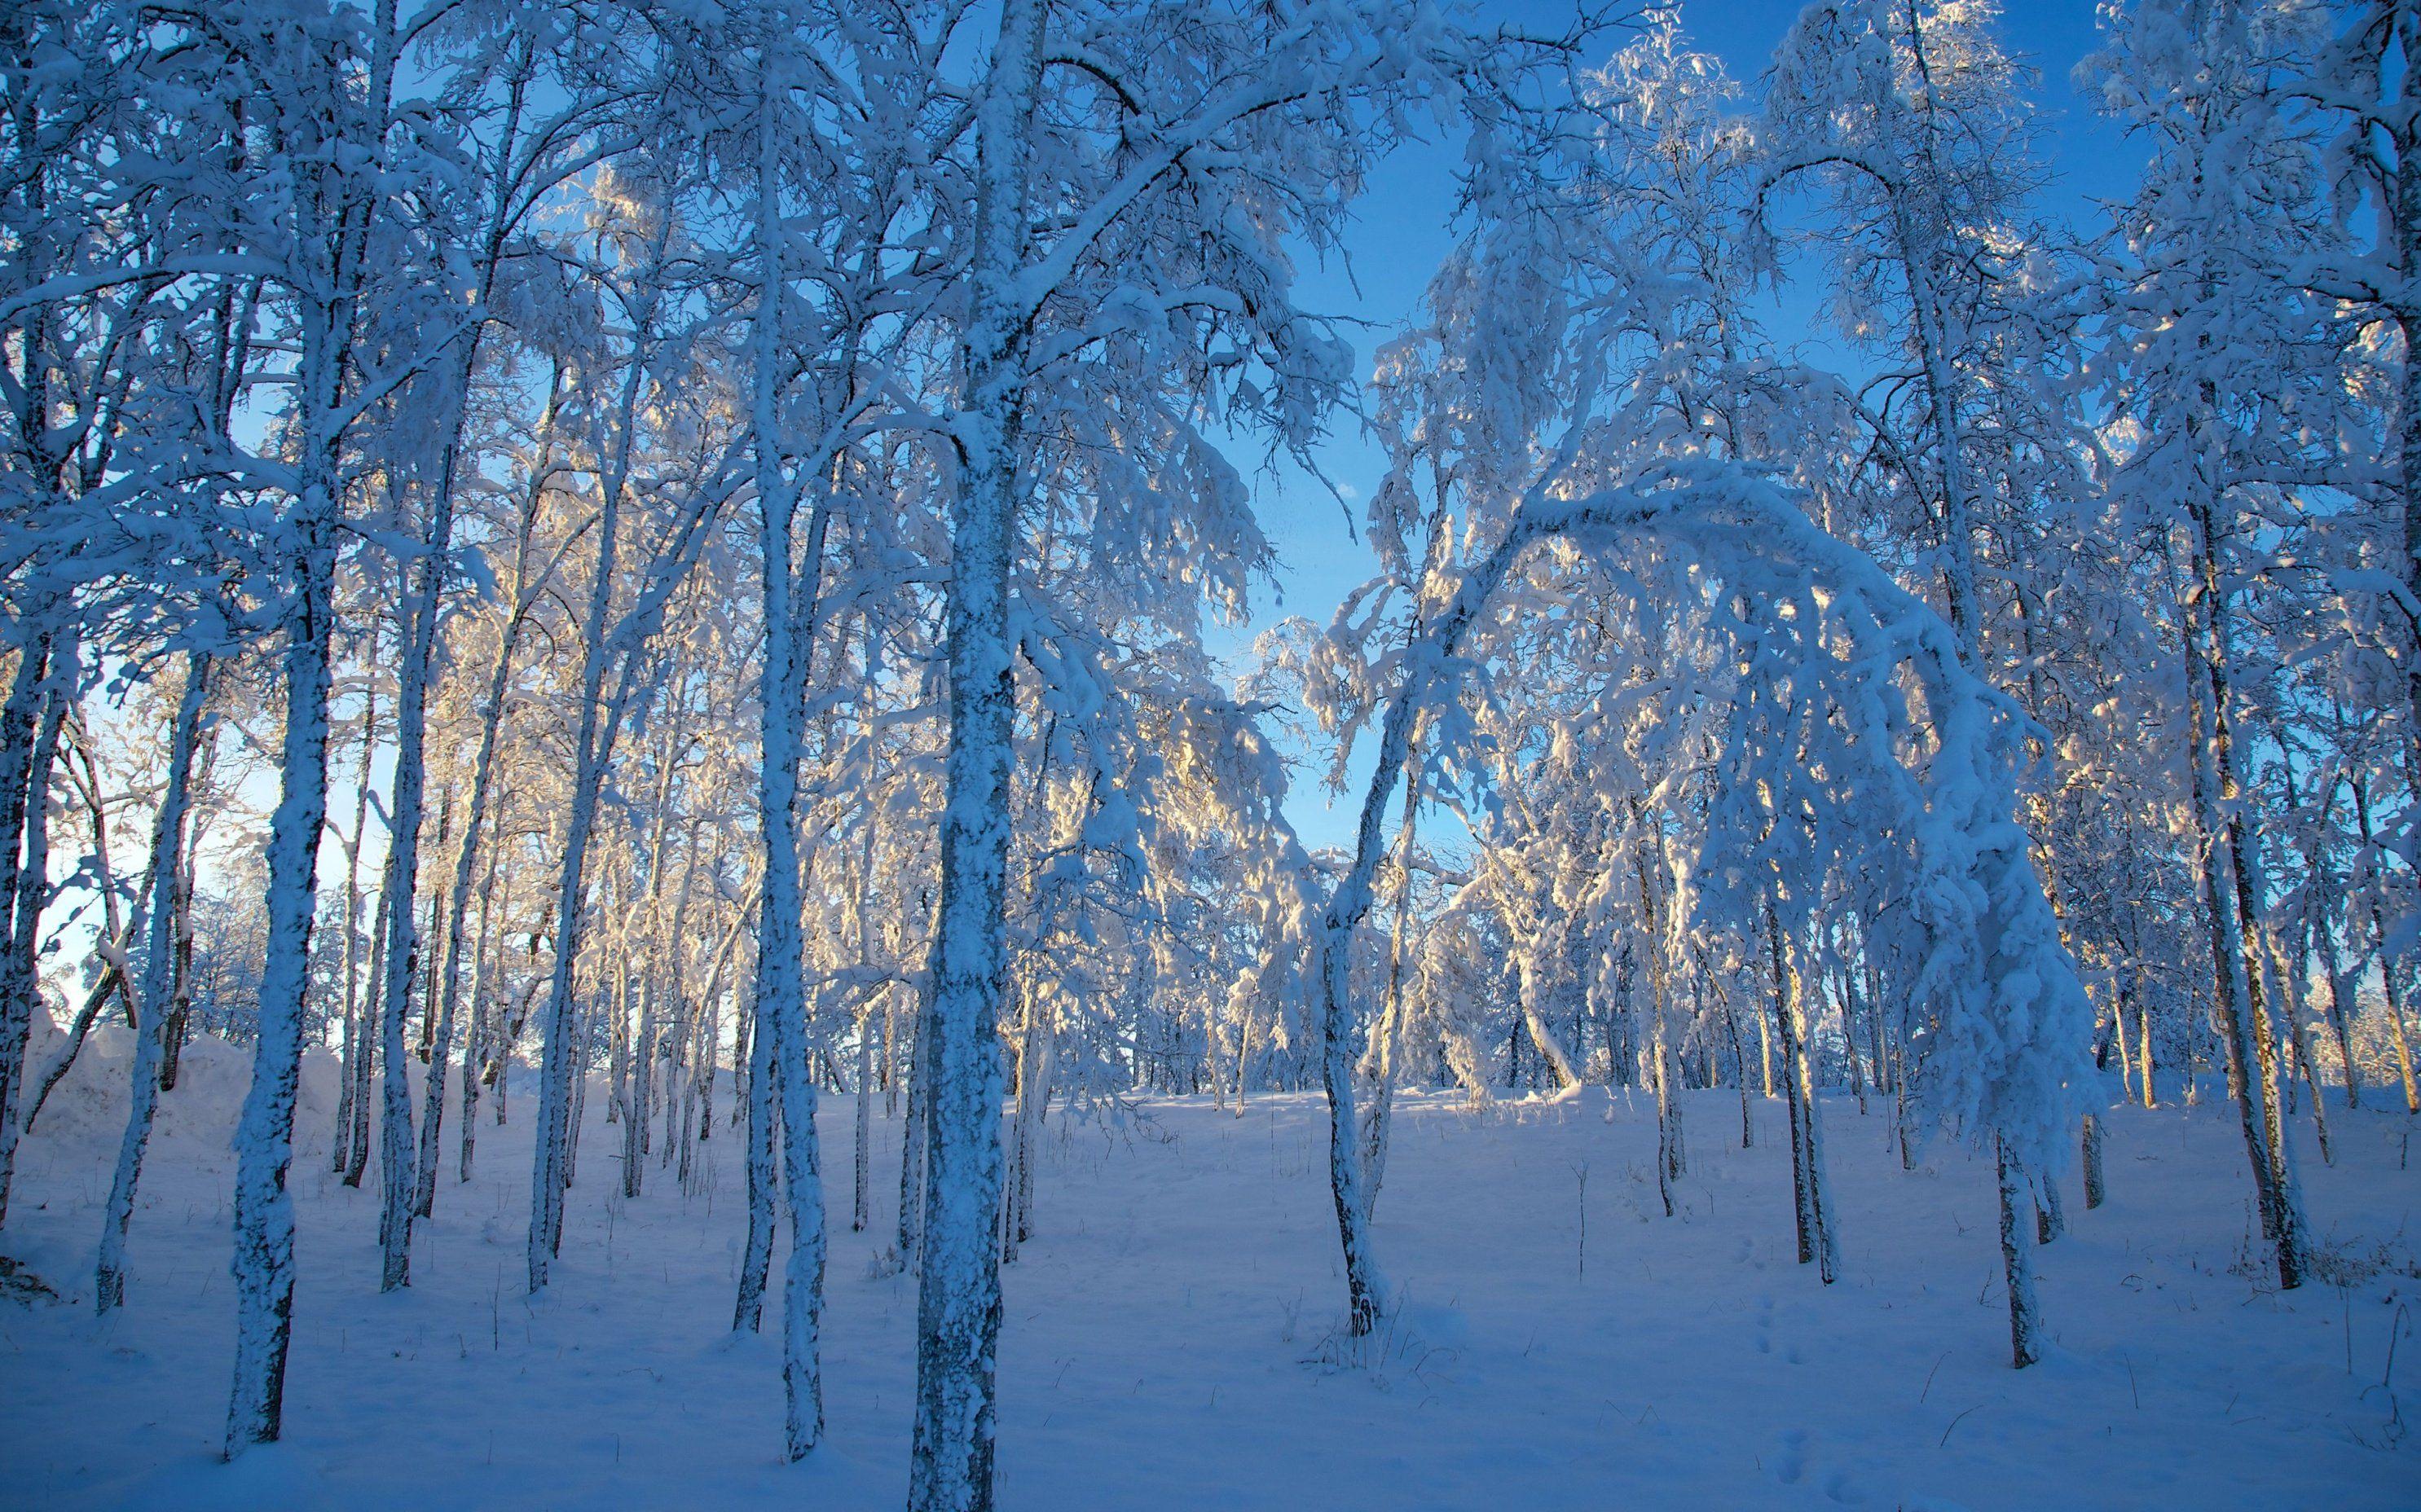 Fondos De Pantalla Paisajes 4k Ultra Hd Winter Wallpaper Desktop Nature Wallpaper Winter Wallpaper